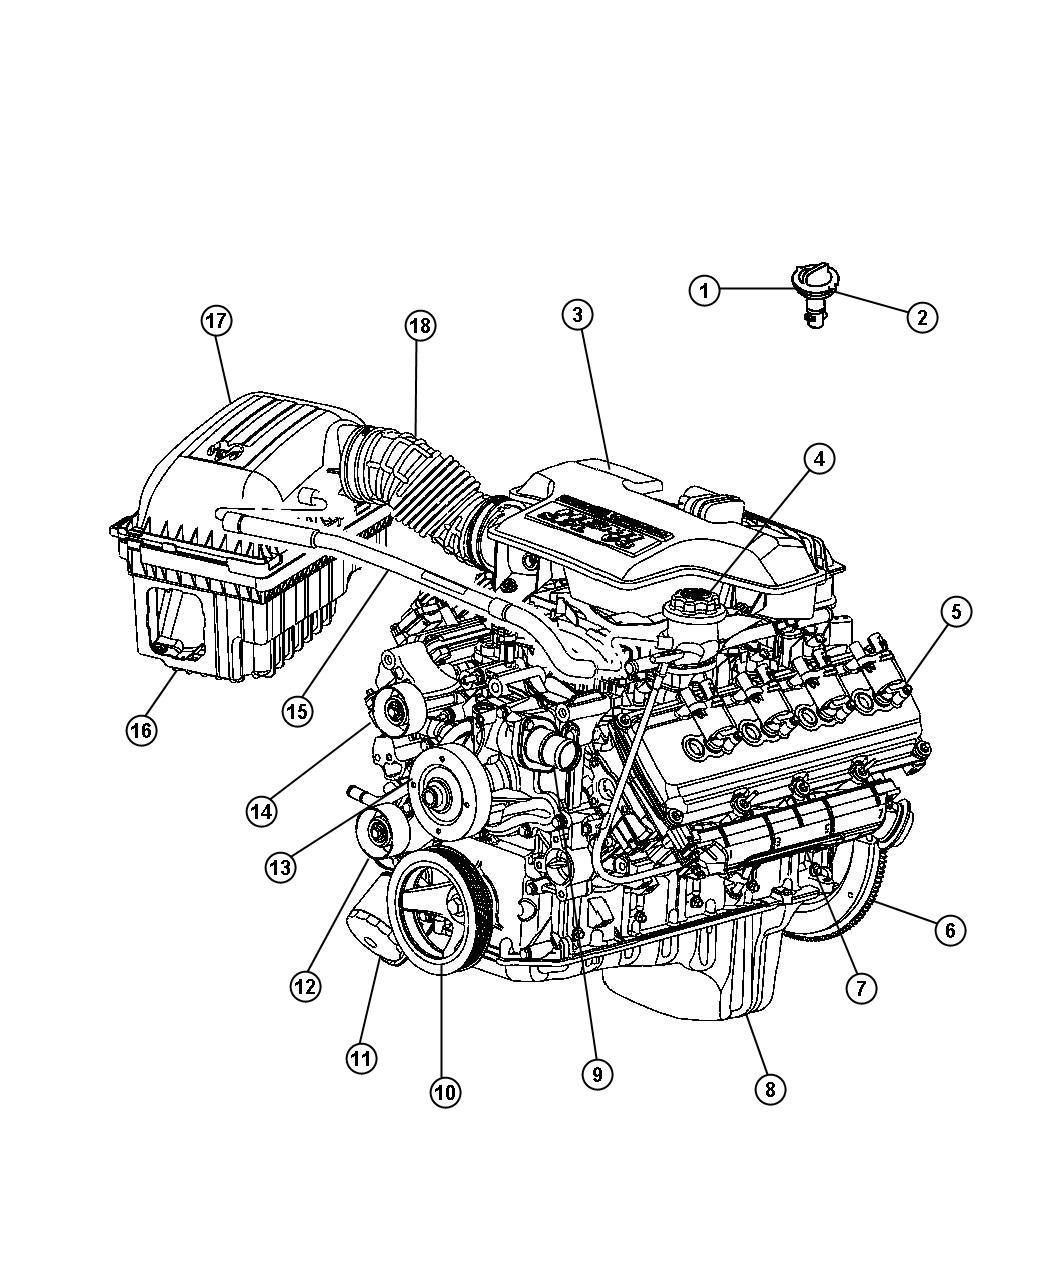 ram 5 7 hemi engine block diagram ram free engine image